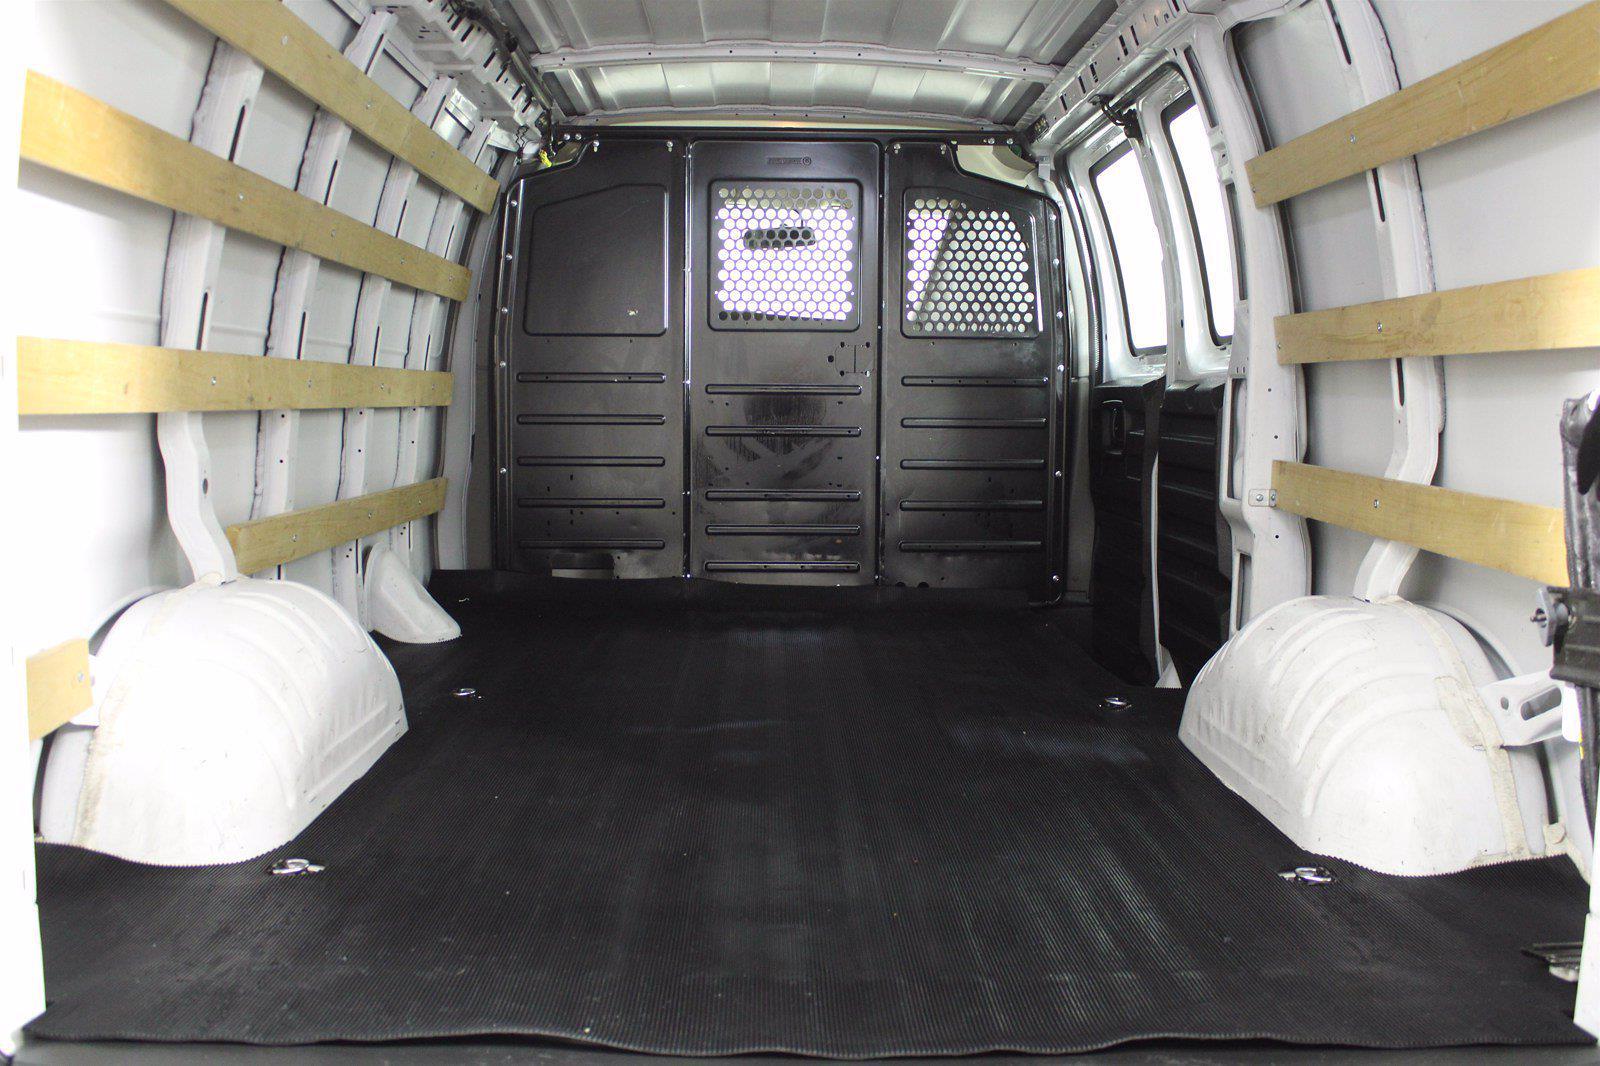 2018 GMC Savana 2500 4x2, Empty Cargo Van #DU90789 - photo 11